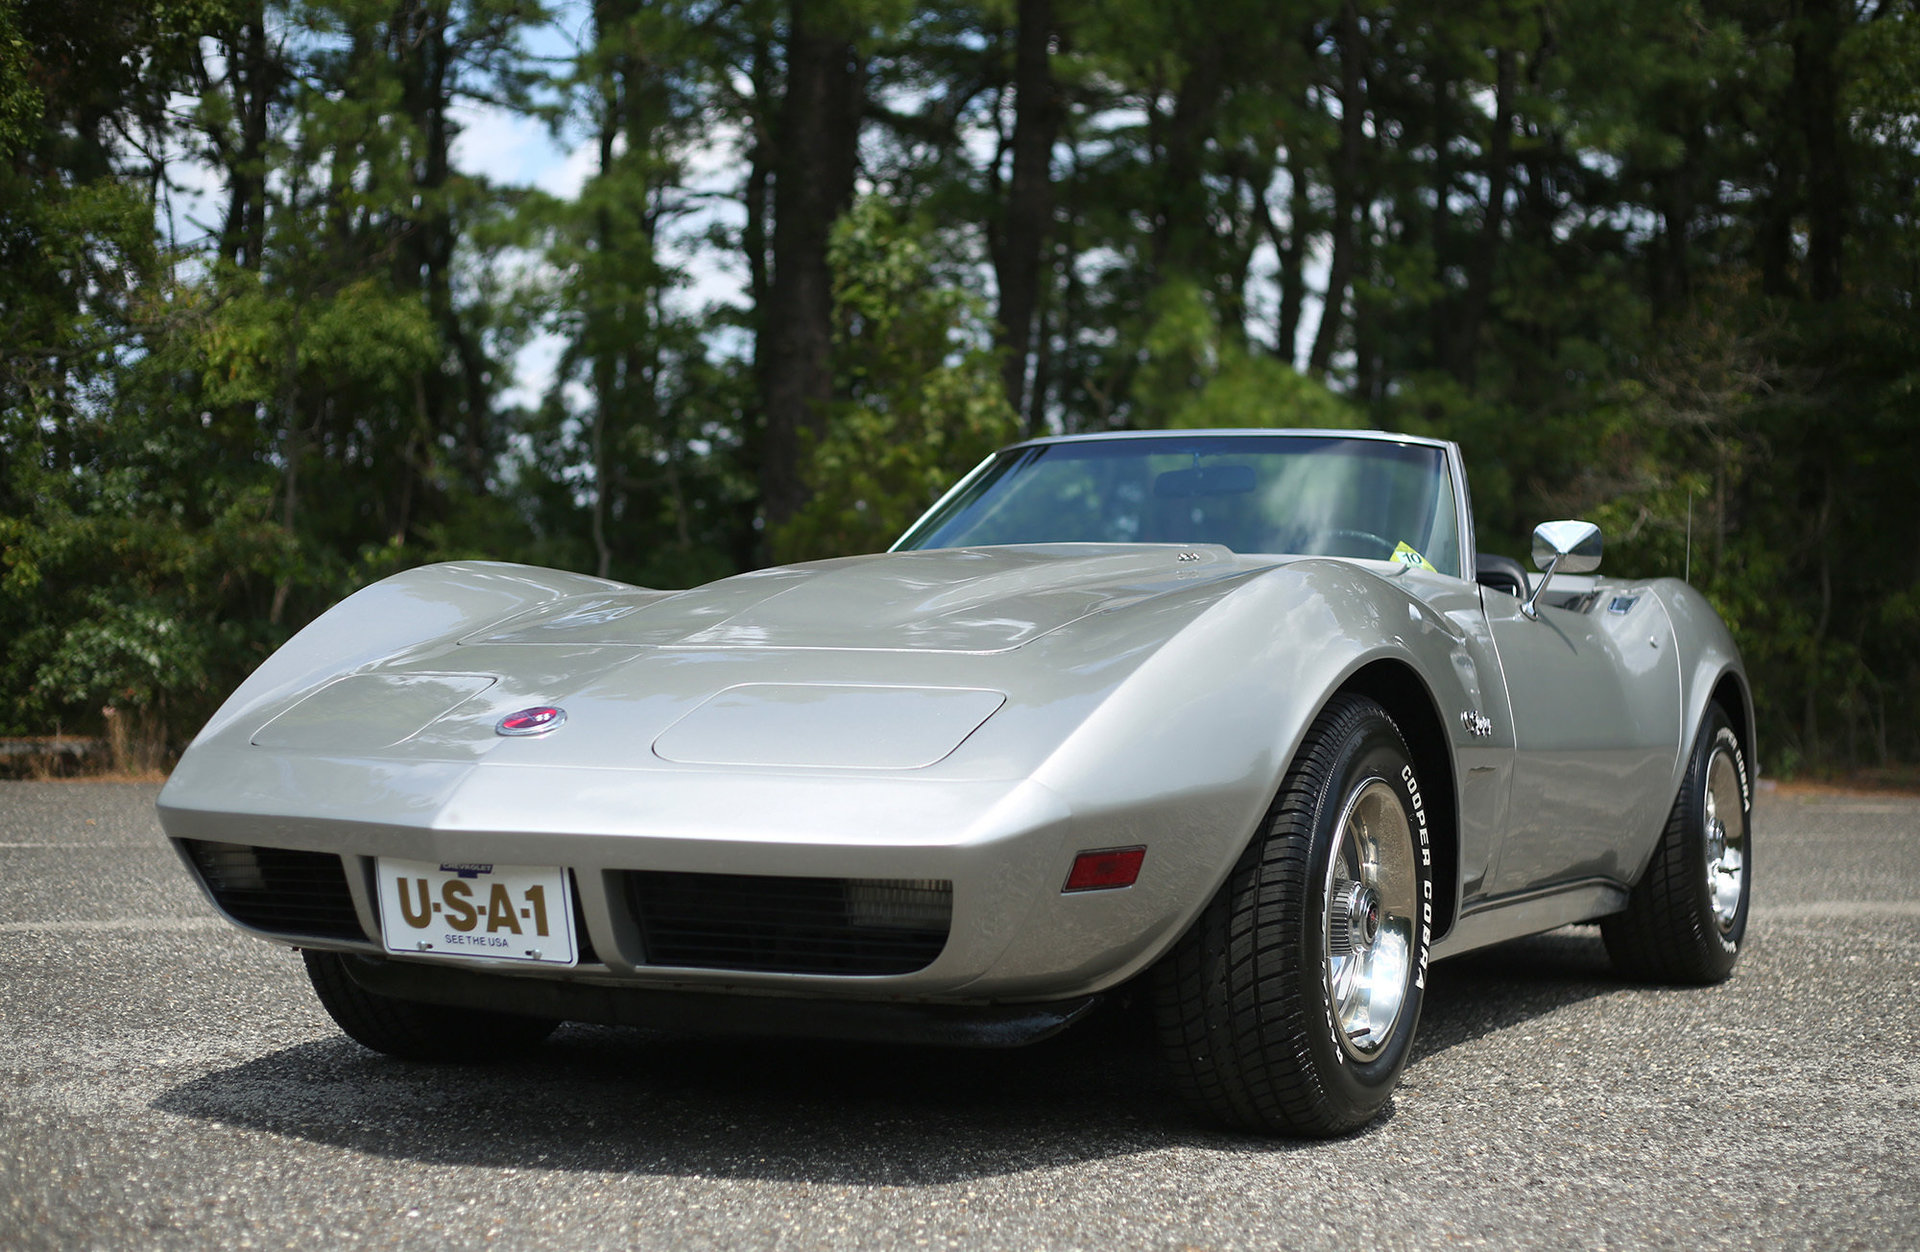 60300cadac8f hd 1974 chevrolet corvette